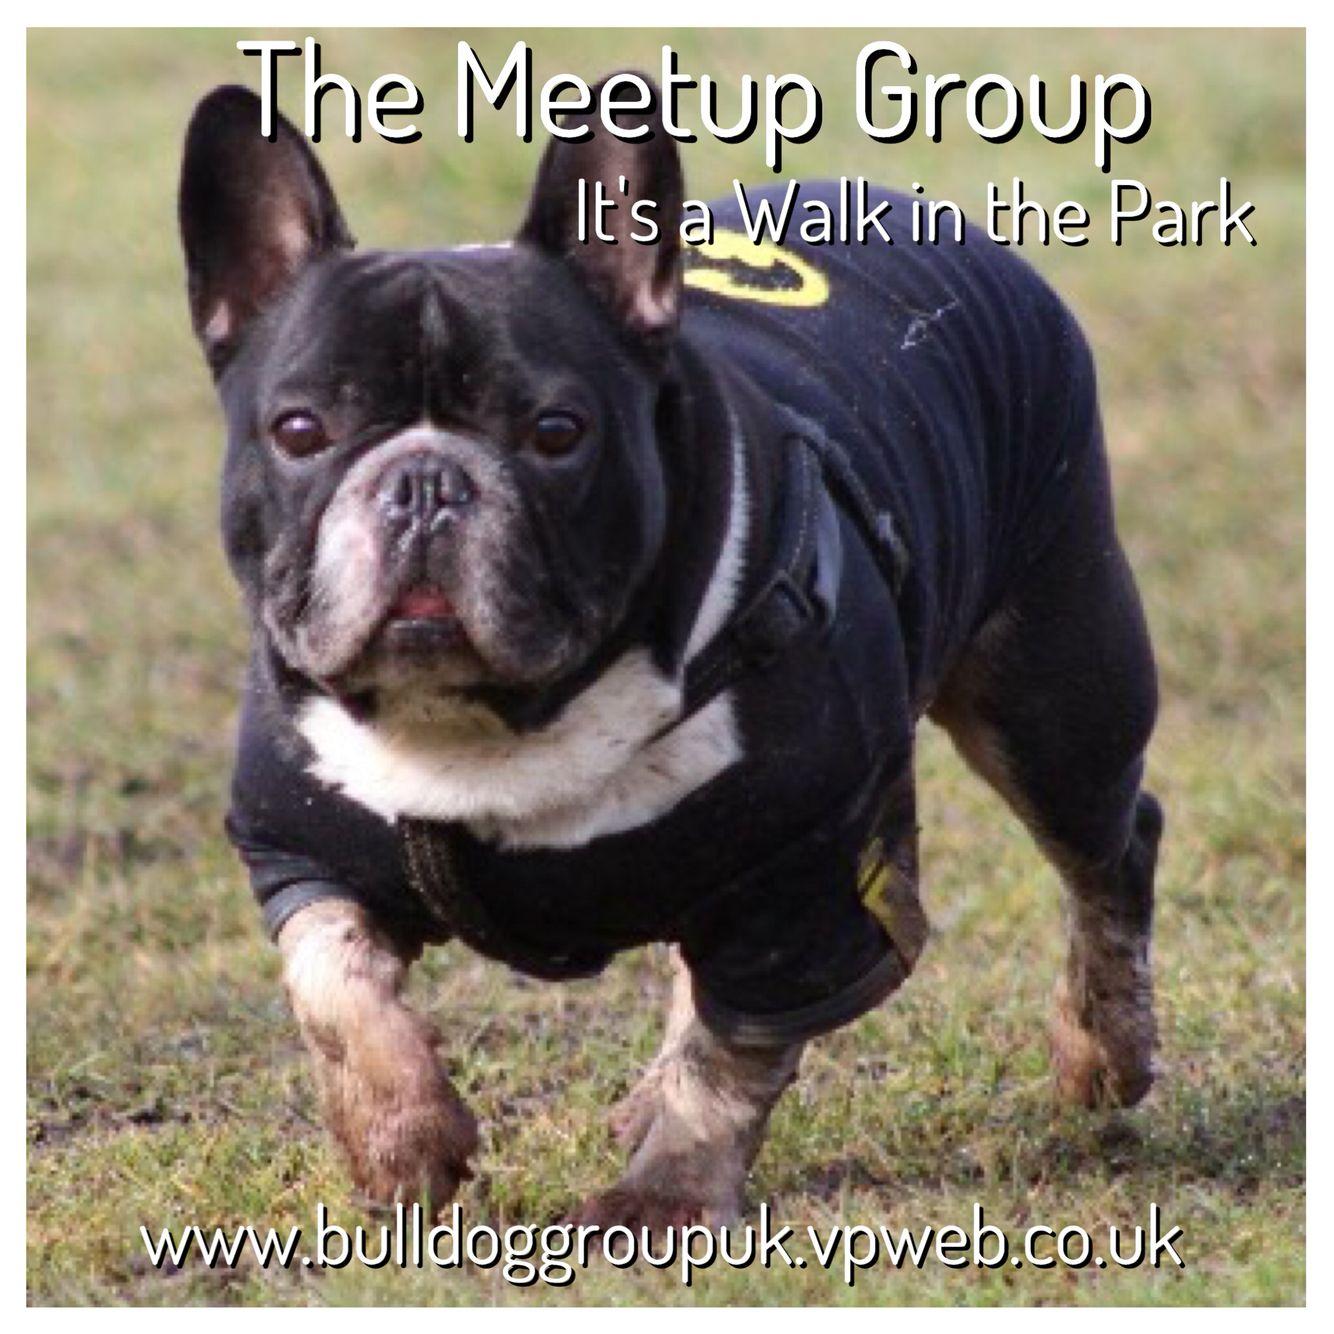 Meetup Batpig, French bulldog, Bulldog